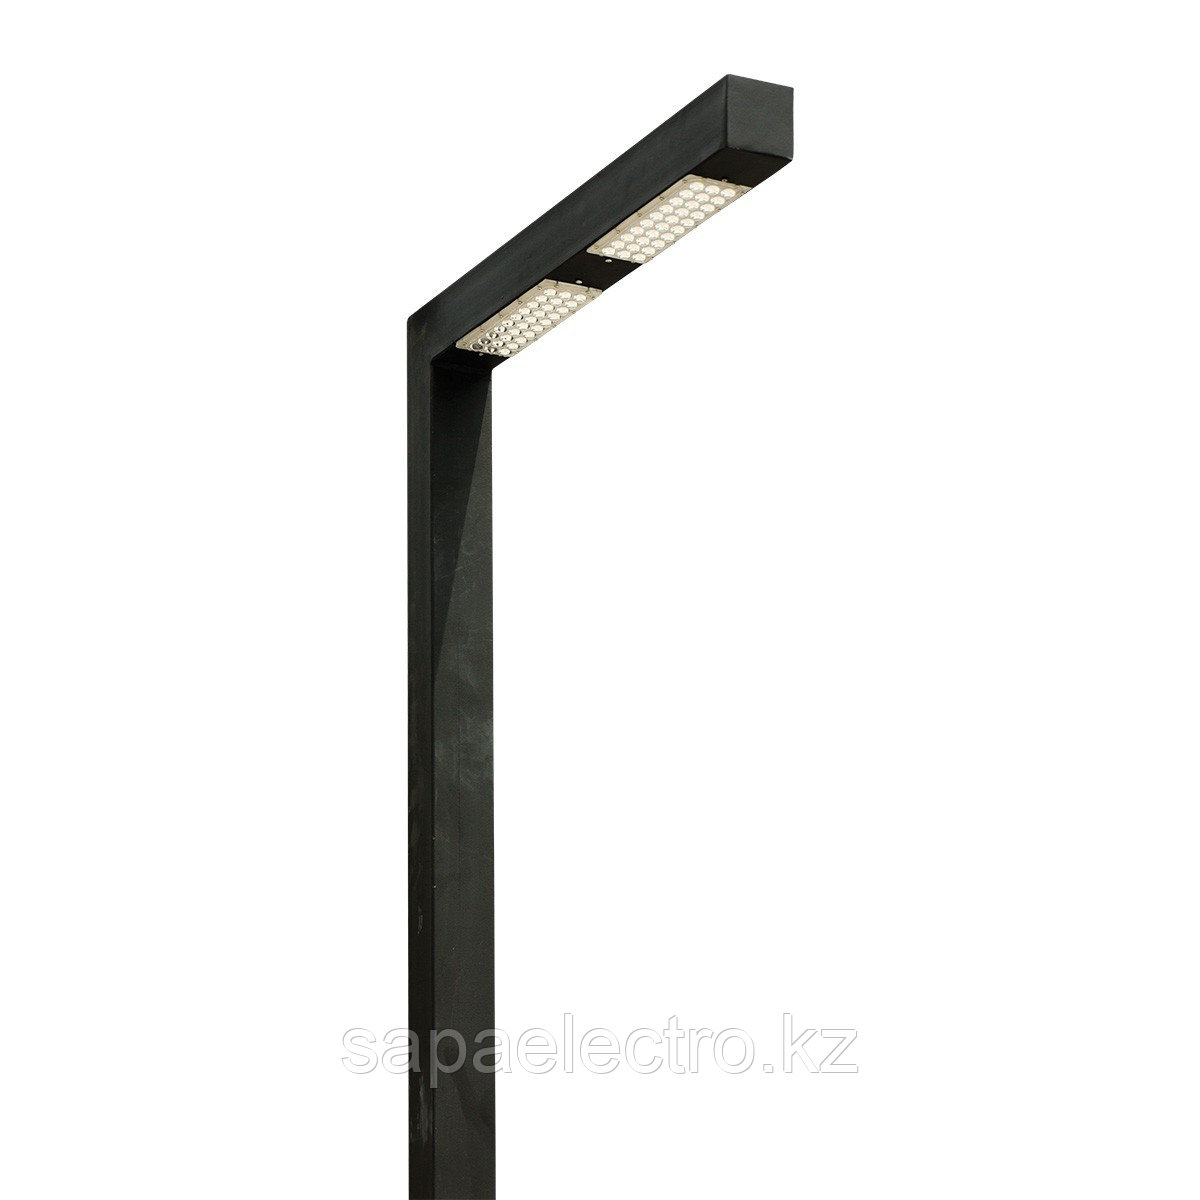 Св-к Профильный LED 60W 80х80 BLACK H-5м MEGALUX 1ш